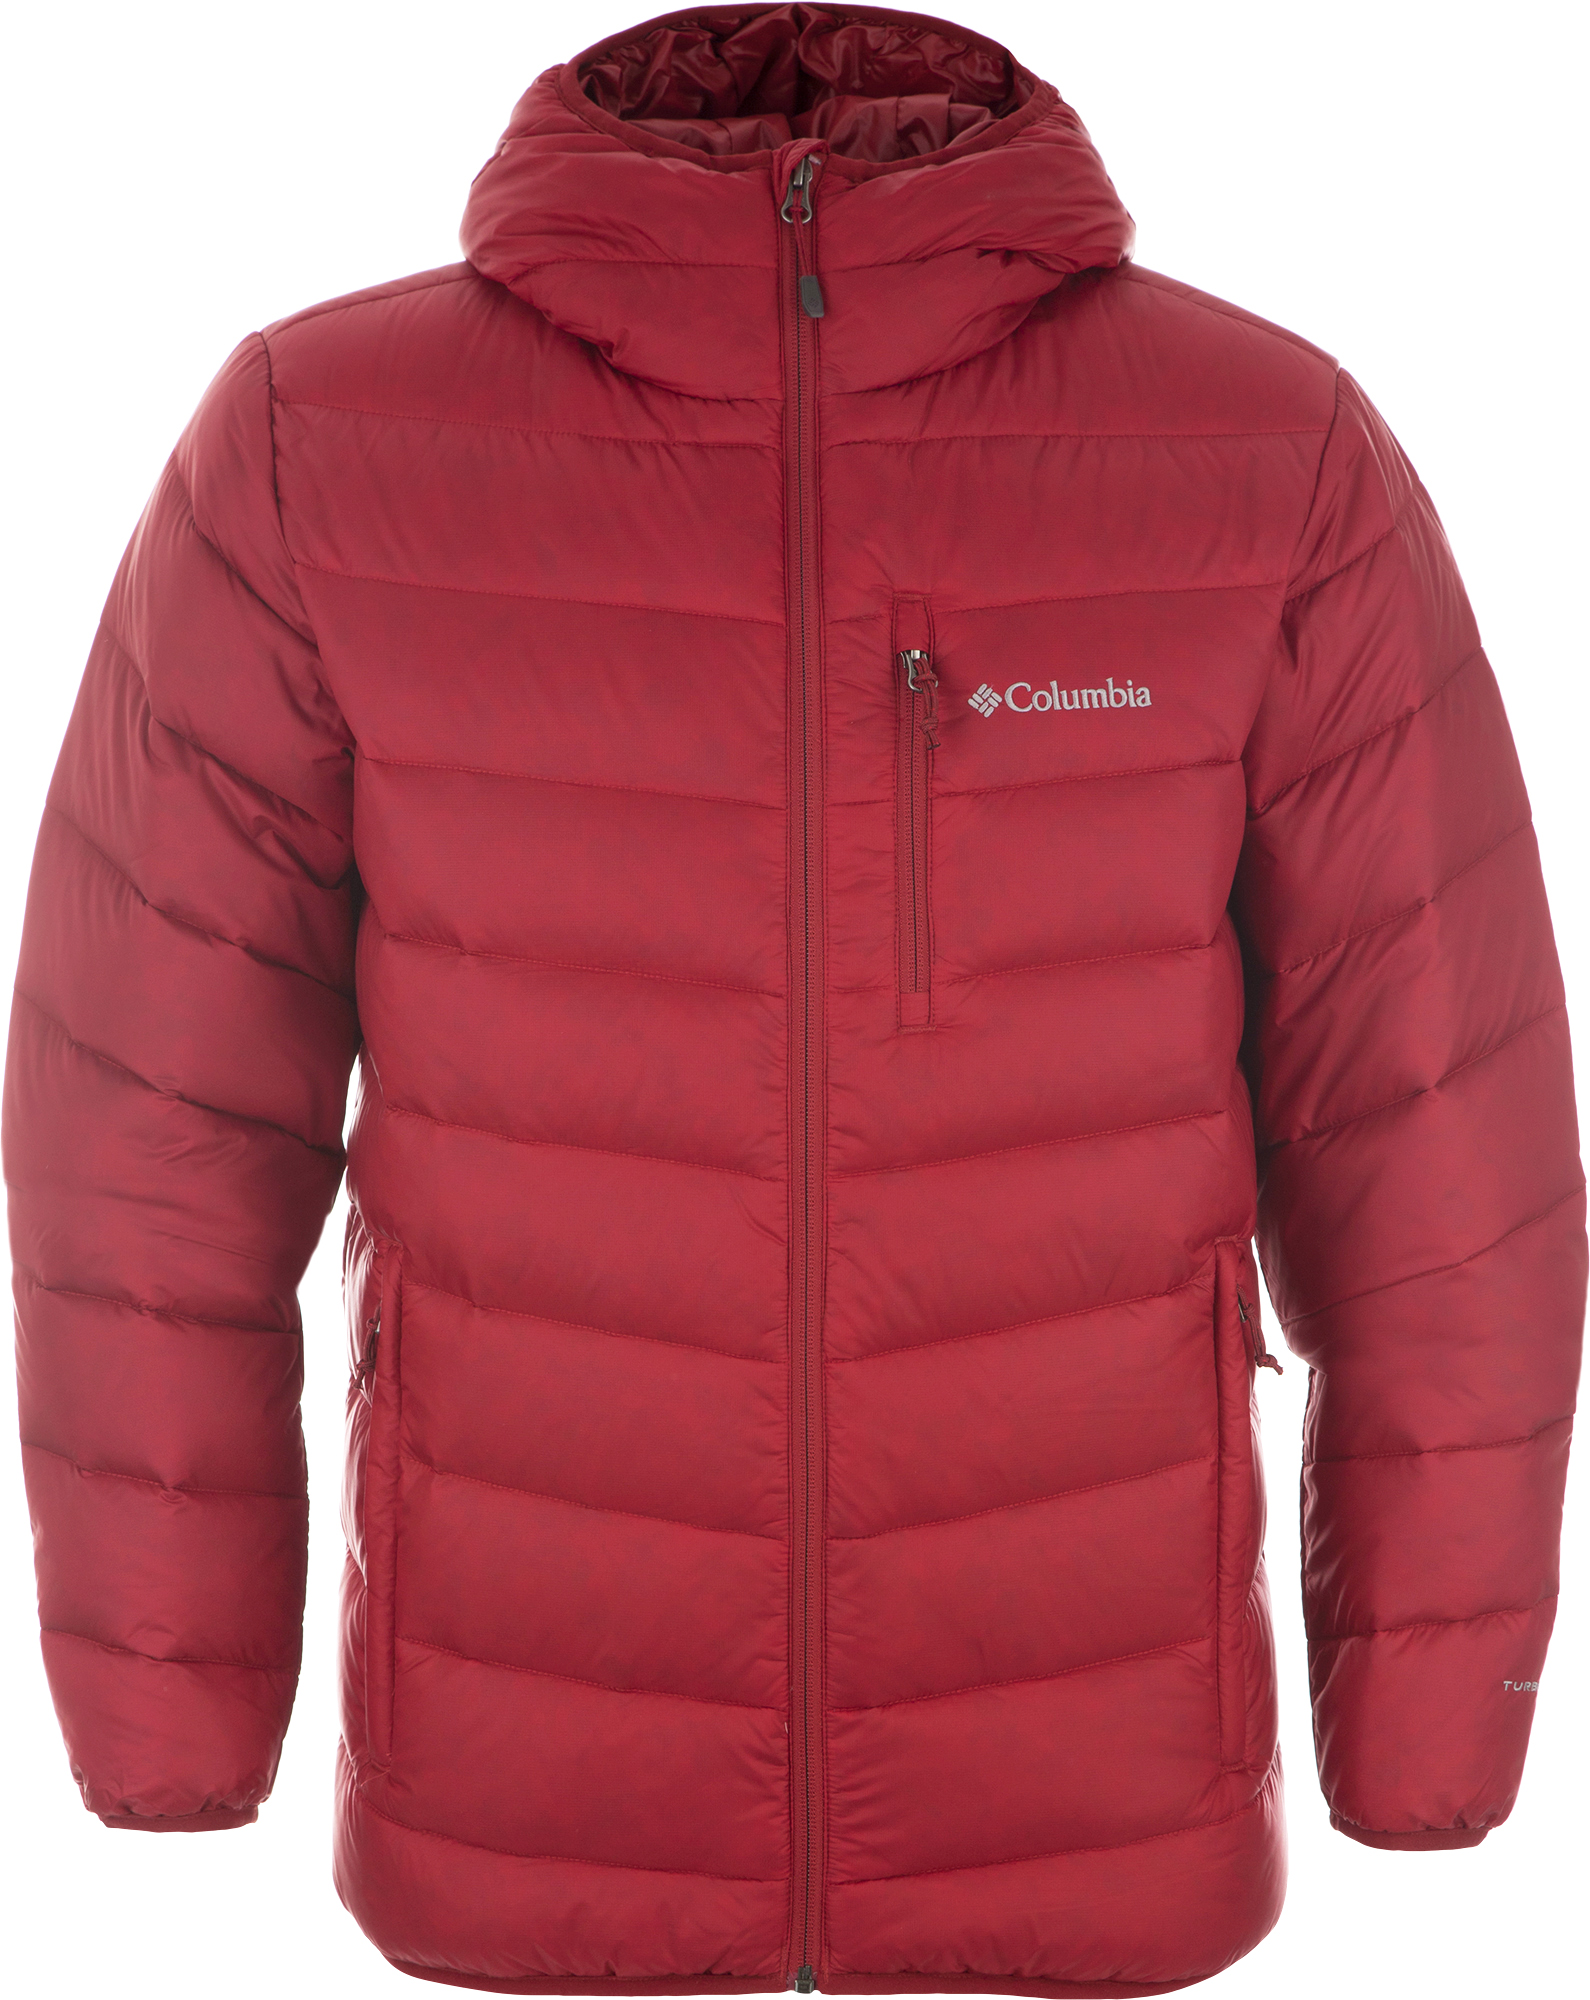 Columbia Куртка пуховая мужская Columbia Hellfire 650 TurboDown, размер 56-58 columbia куртка 3 в 1 мужская columbia whirlibird размер 48 50